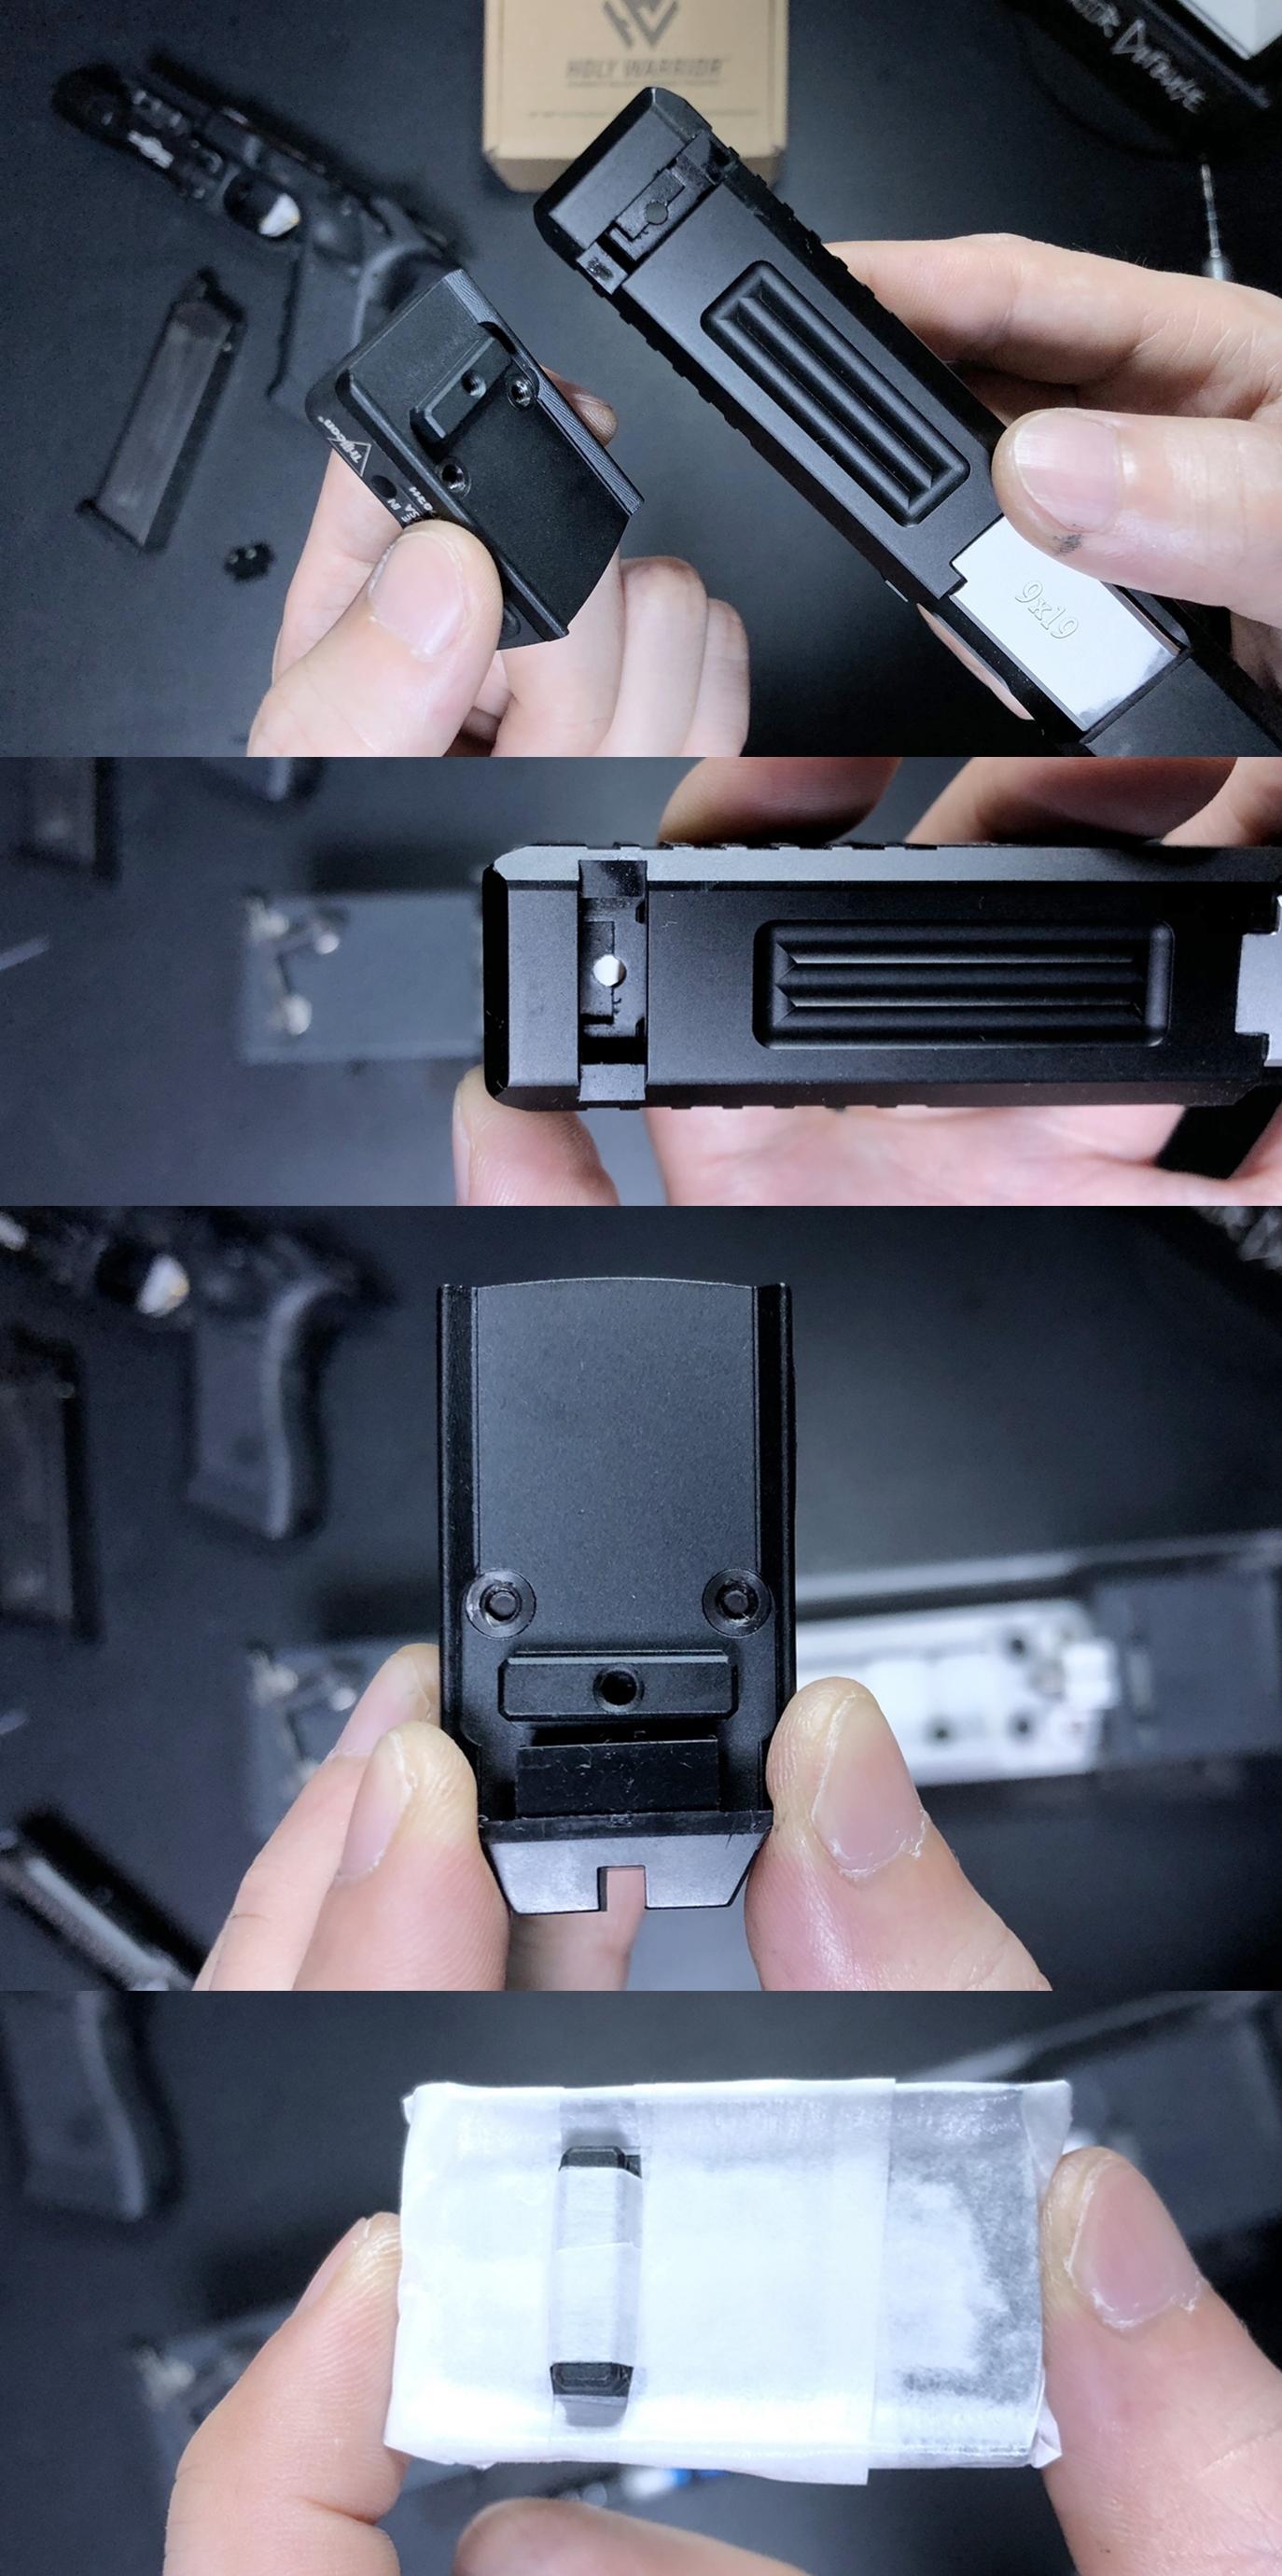 7 HolyWarrior製 RMR Trijicon Type ドットサイト GET!! 噂のHW製 最新 超軽量 複合材質 樹脂 タイプを購入したけど速攻で仲間に奪われました(笑)!! Glock G17 GBB カスタム!! 購入 開封 取付 加工 レビュー!!